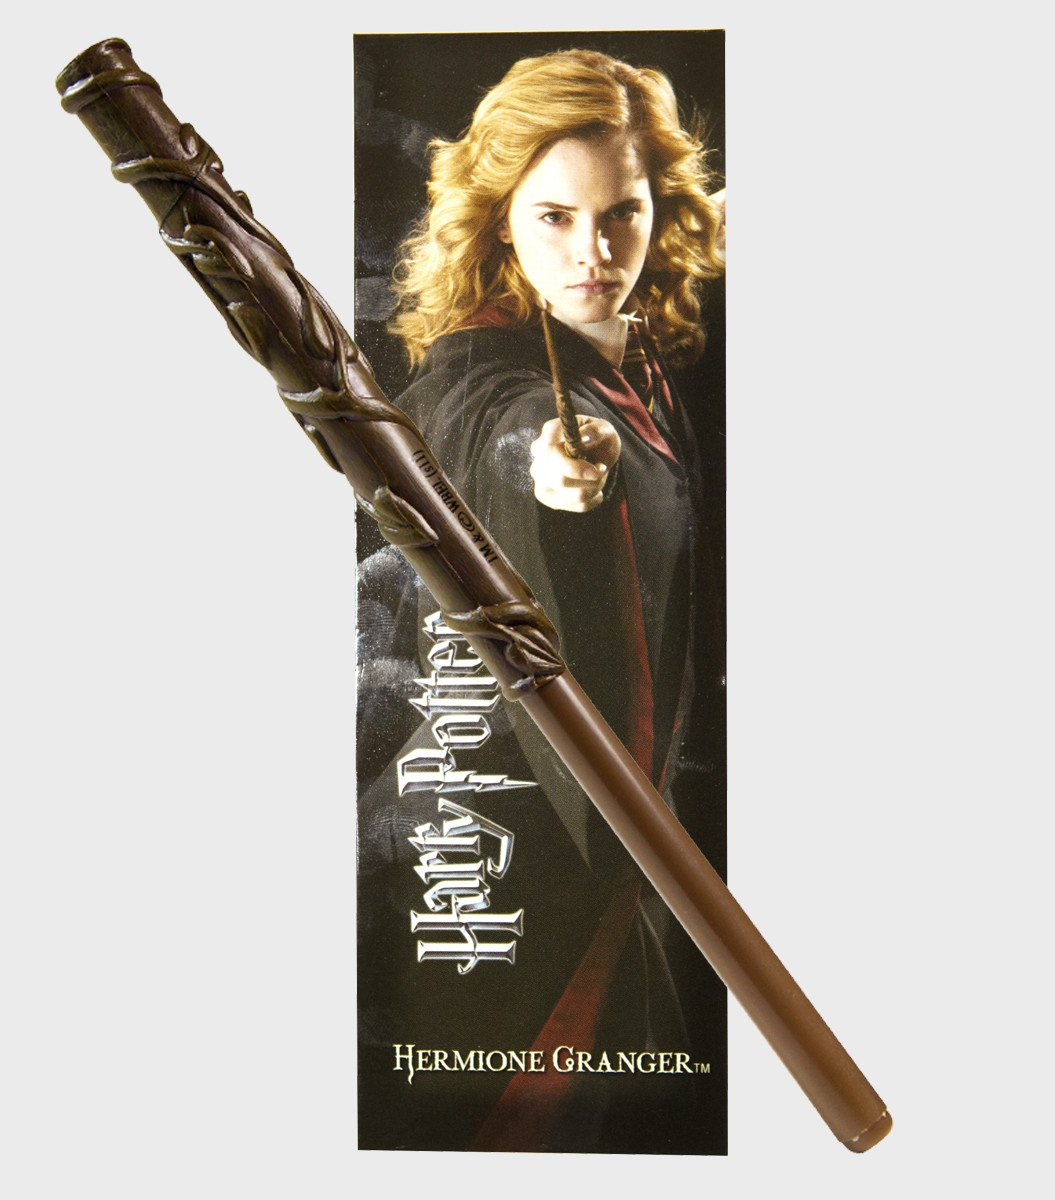 Harry Potter - Hermiones Wand Penna & Bokmärke thumbnail